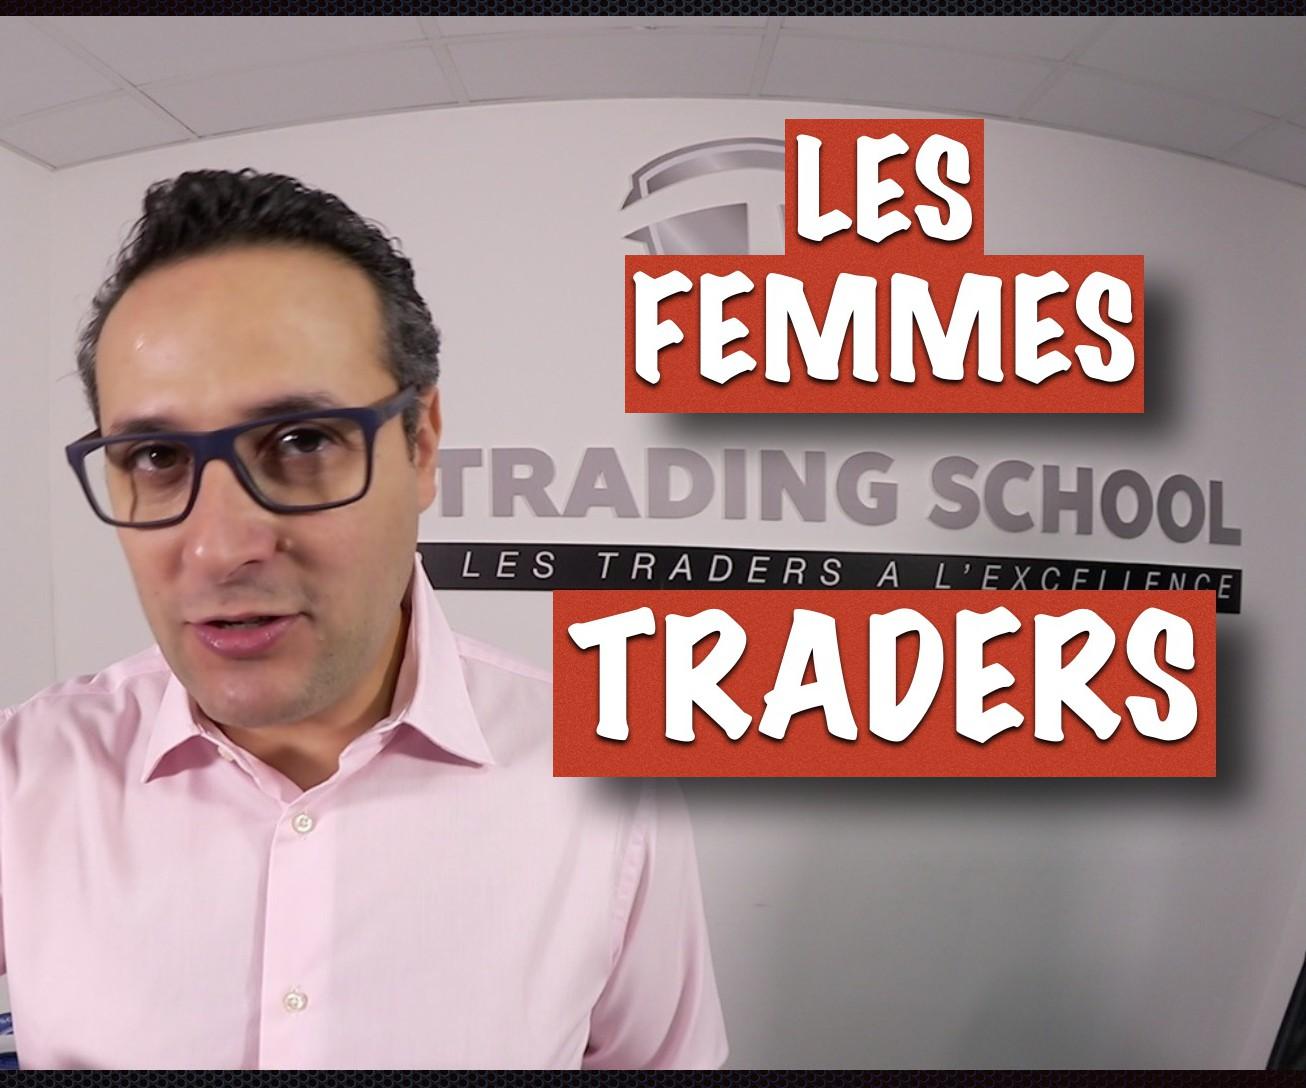 Femme Trader : une femme a-t-elle ses chances en trading ?